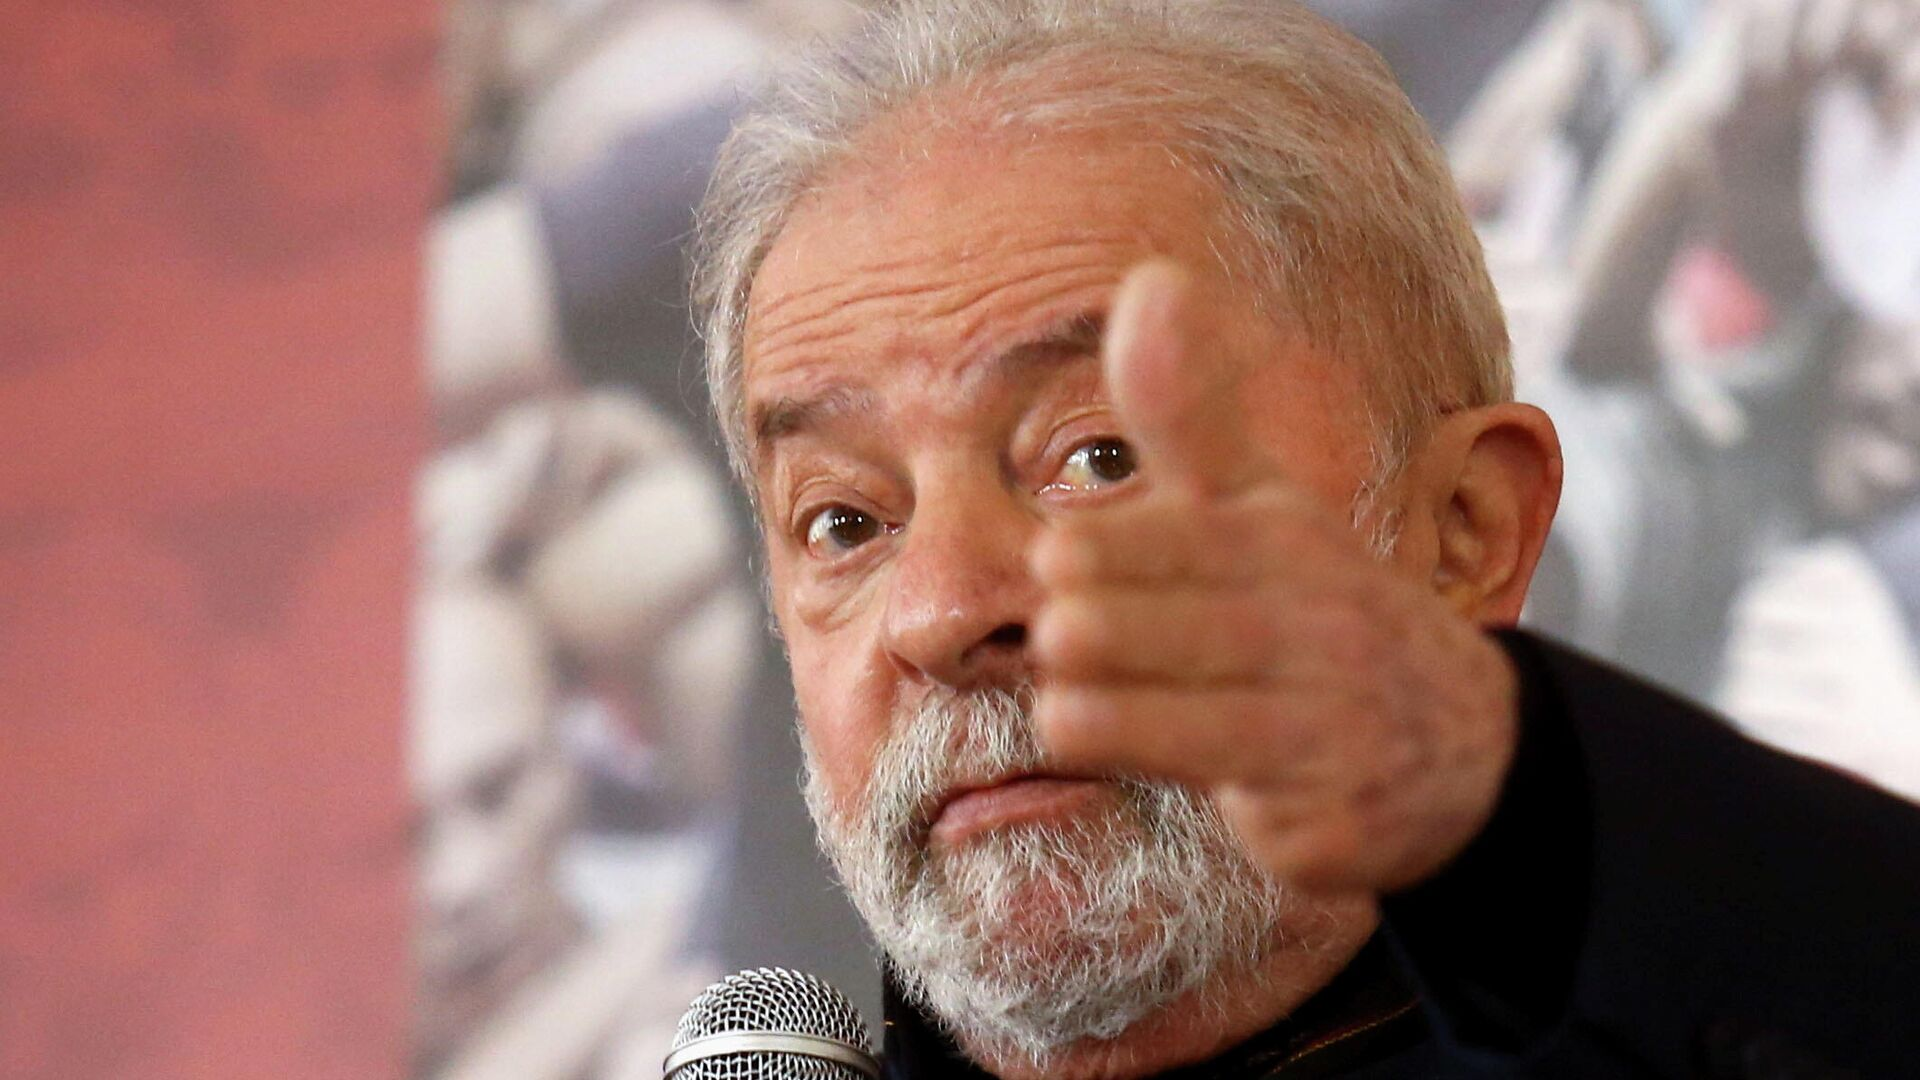 El expresidente de Brasil Luiz Inacio Lula da Silva - Sputnik Mundo, 1920, 19.08.2021